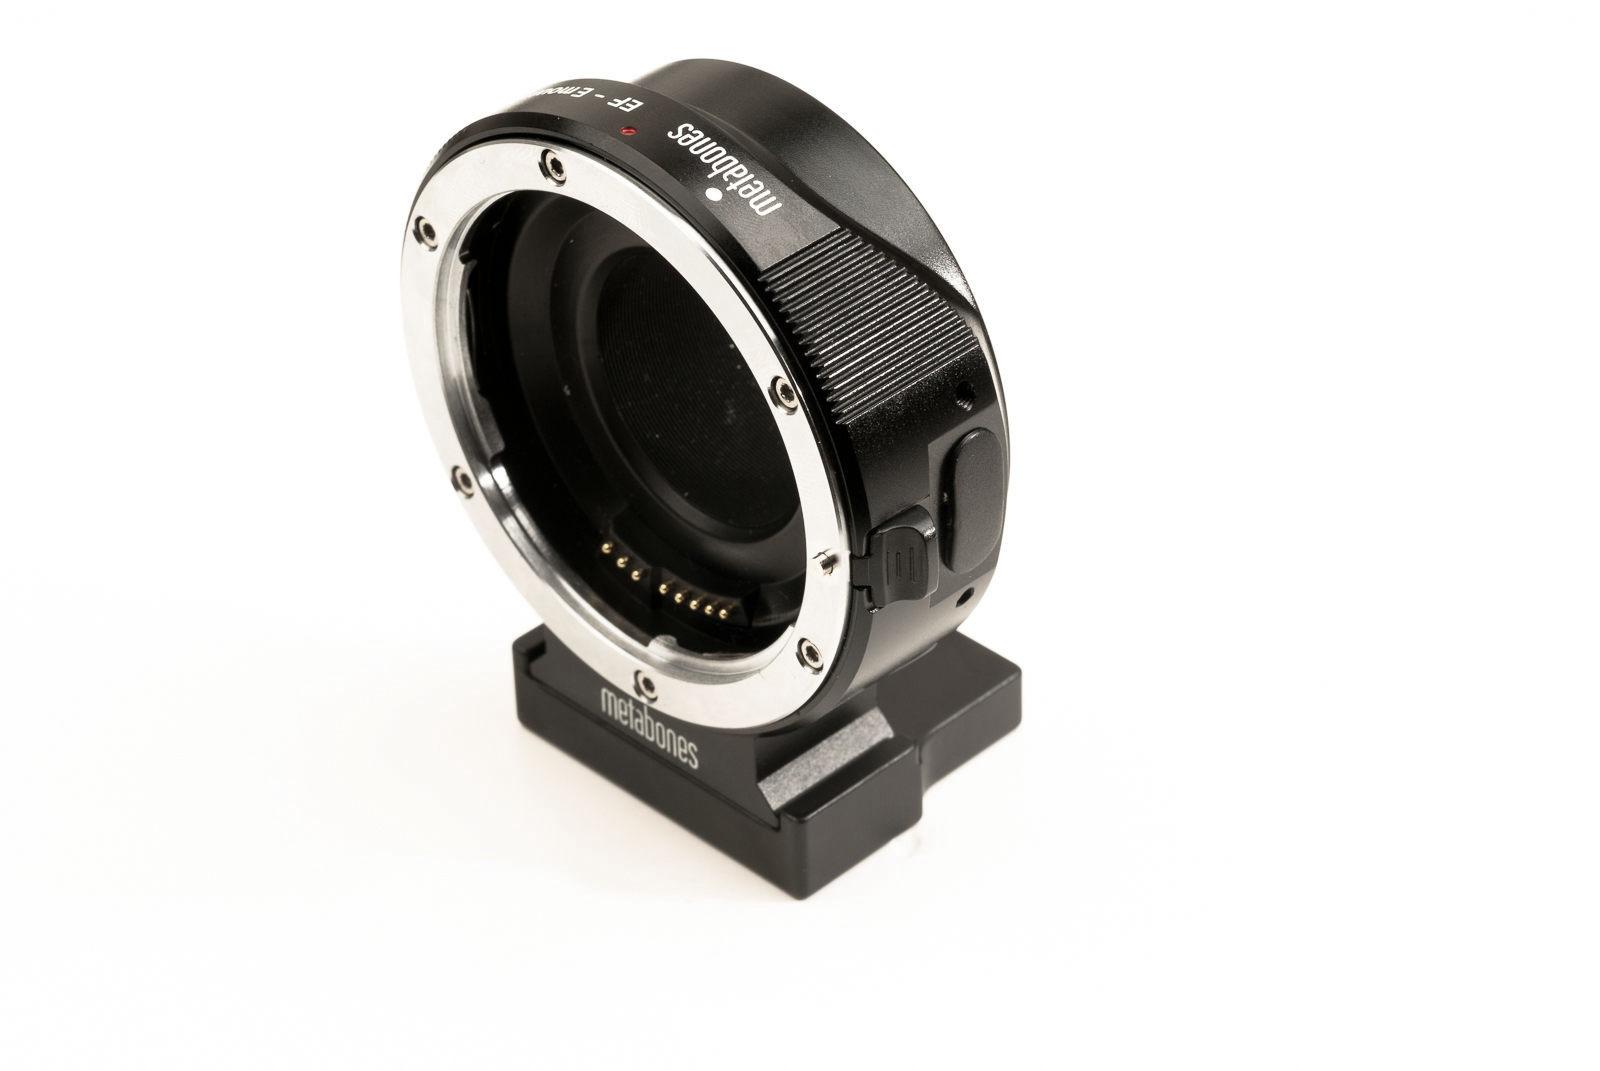 Hejnar Extender Spacer on Metabones Adapter overview